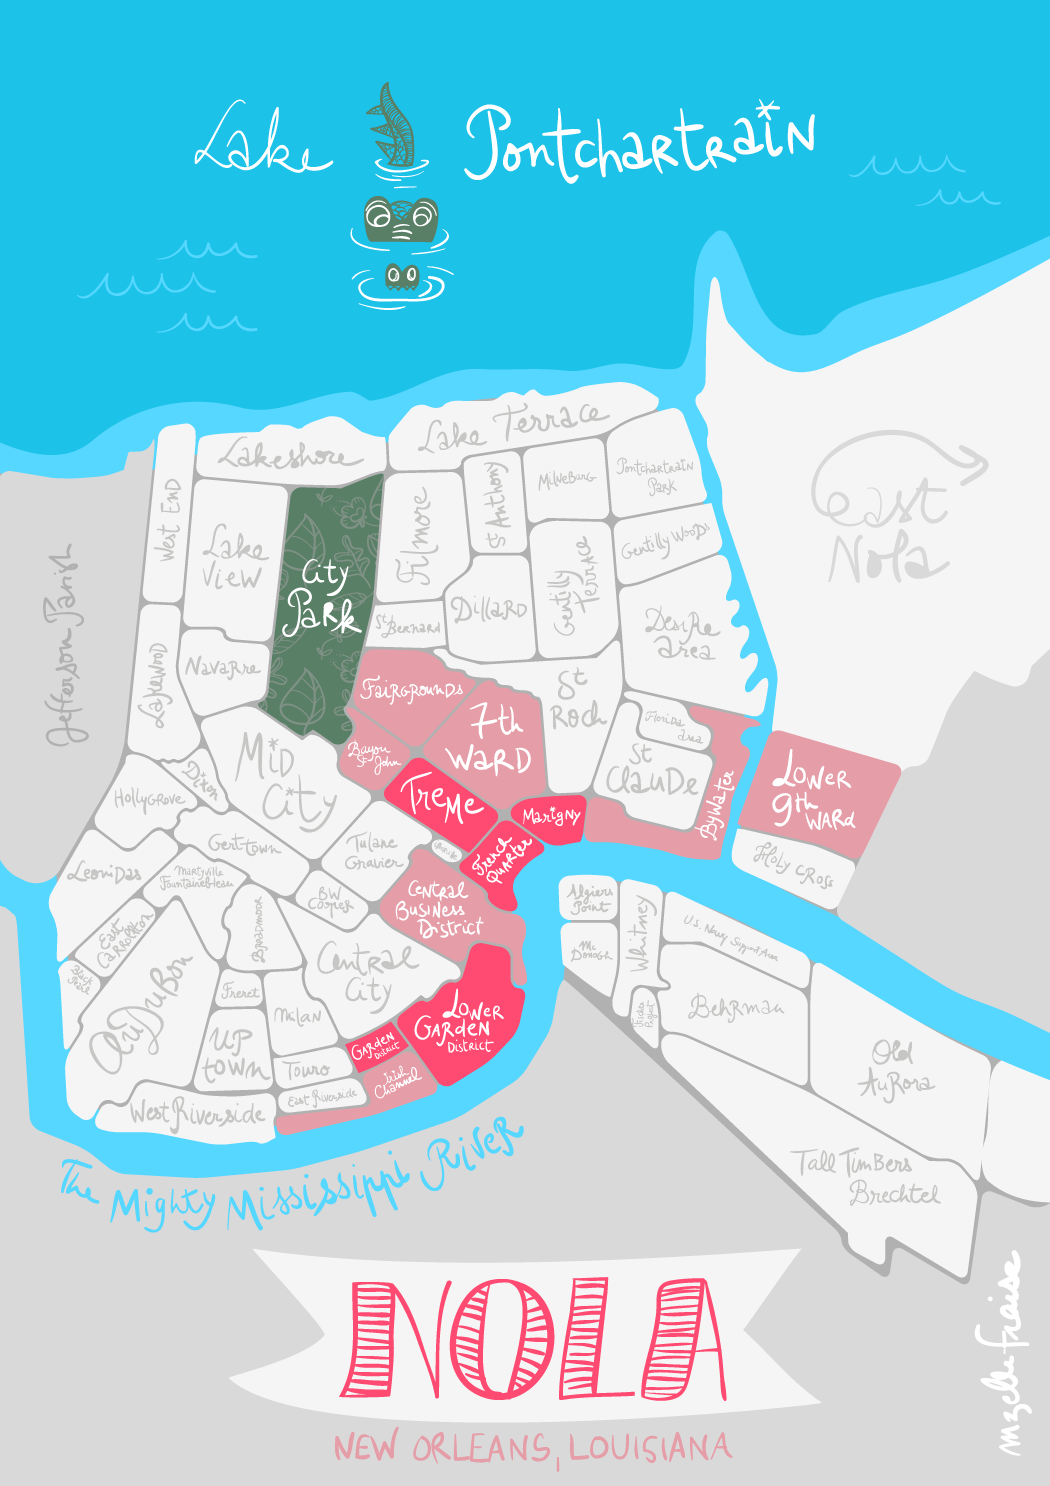 New Orleans, part 1. : Marigny | NOLA | New orleans map ... on florida map, shreveport louisiana map, norco louisiana map, los angeles california map, atlanta georgia map, grand isle louisiana map, san francisco california map, louisiana on us map, bossier city louisiana map, covington louisiana map, philadelphia map, baton rouge zip code map, alabama louisiana map, gettysburg pennsylvania map, america louisiana purchase map, natchez map, southern louisiana map, montgomery alabama map, orleans parish map, new louisiana profile map,